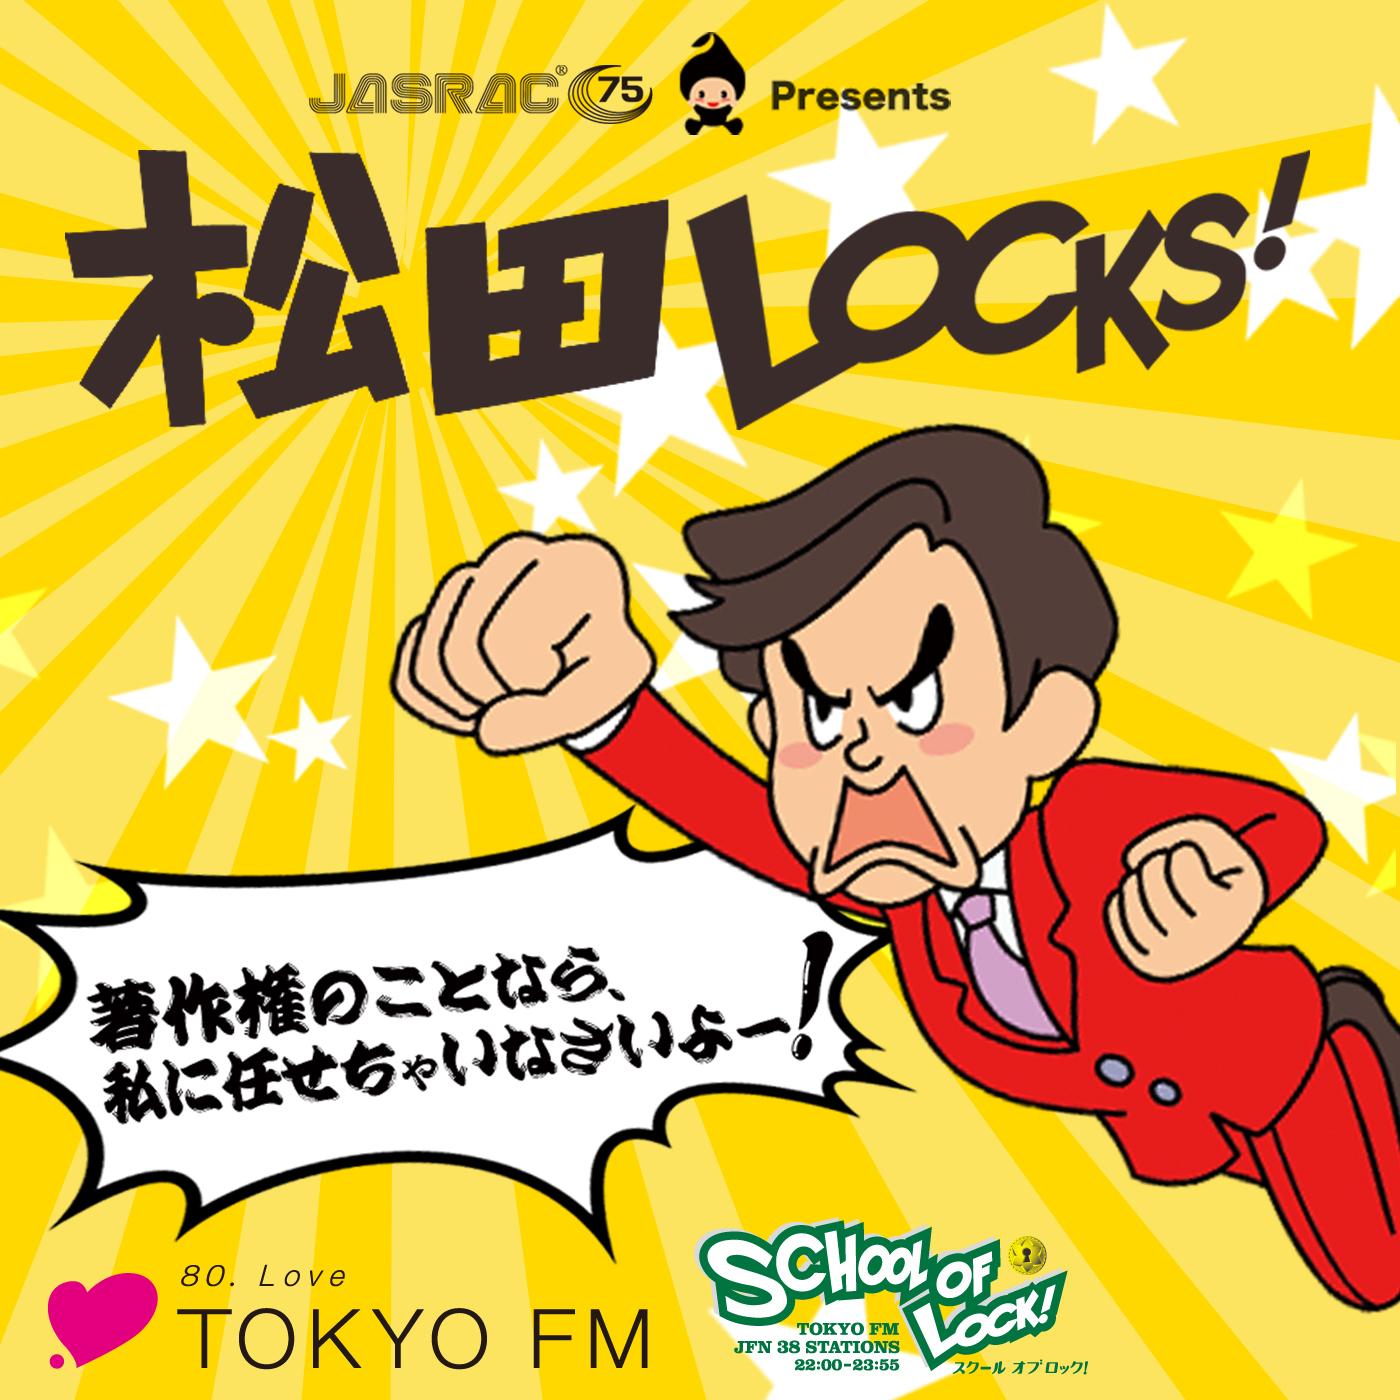 JASRAC presents 松田LOCKS!